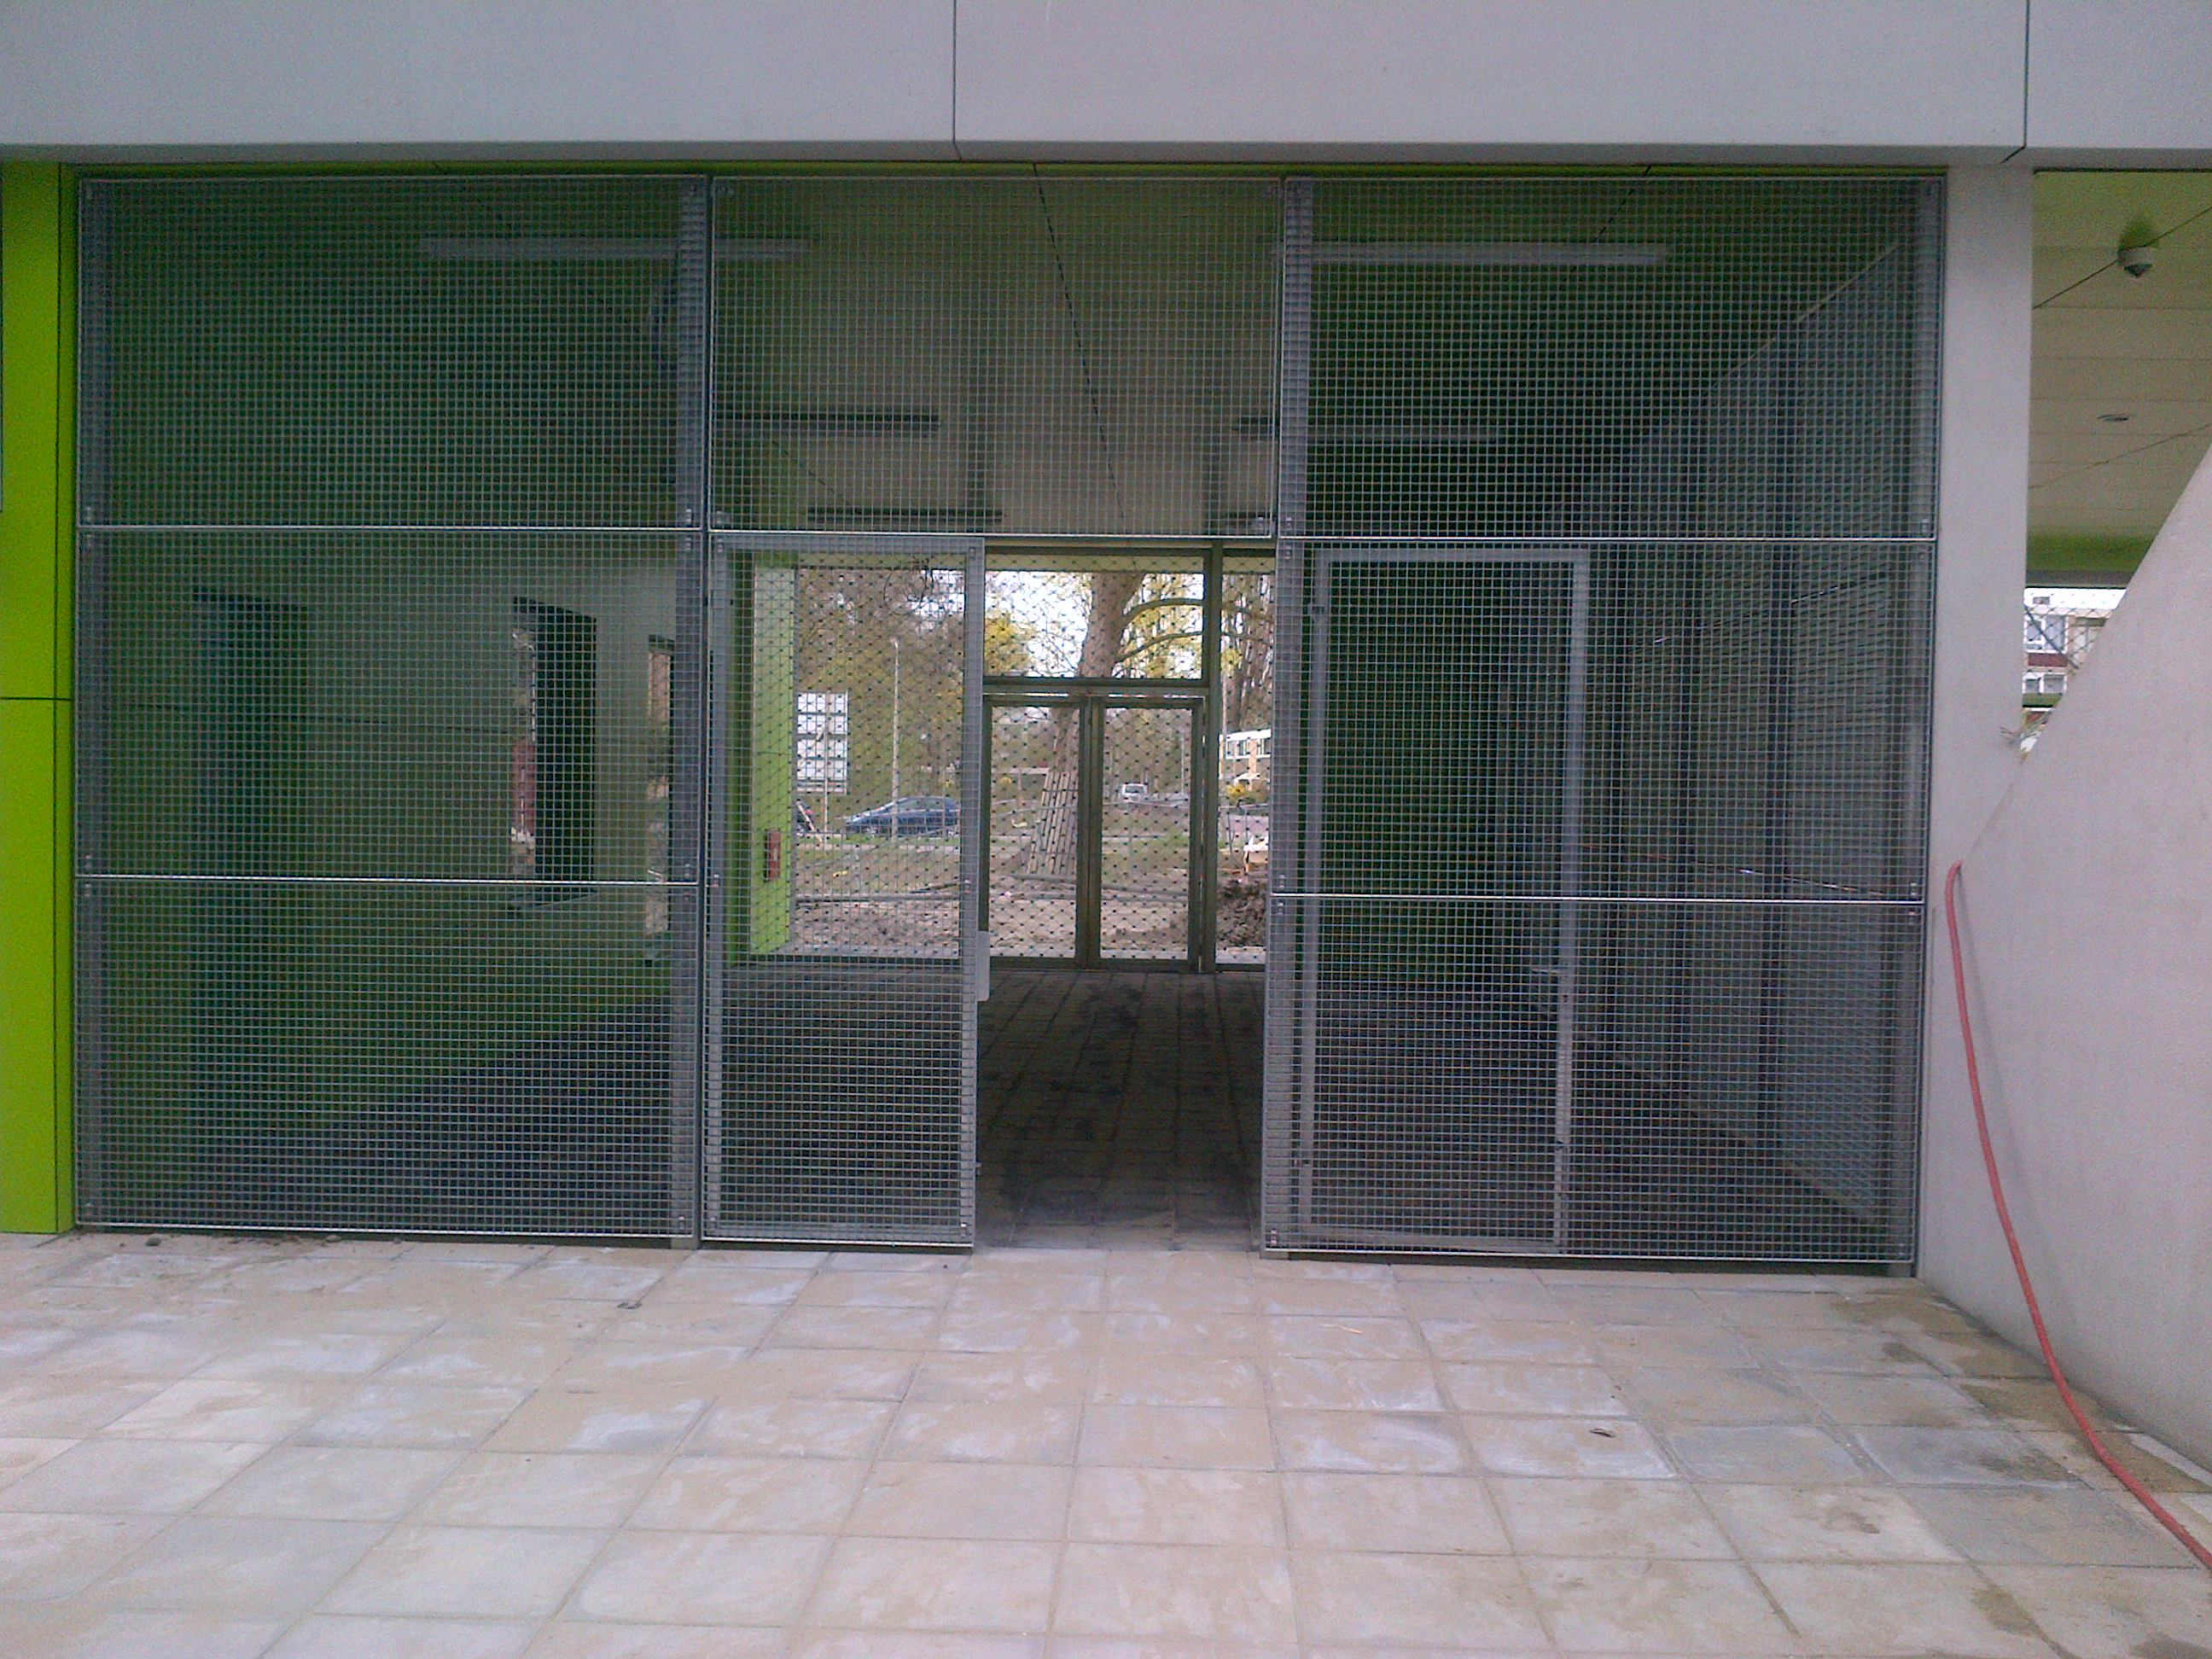 Amstelveen-20130424-00781